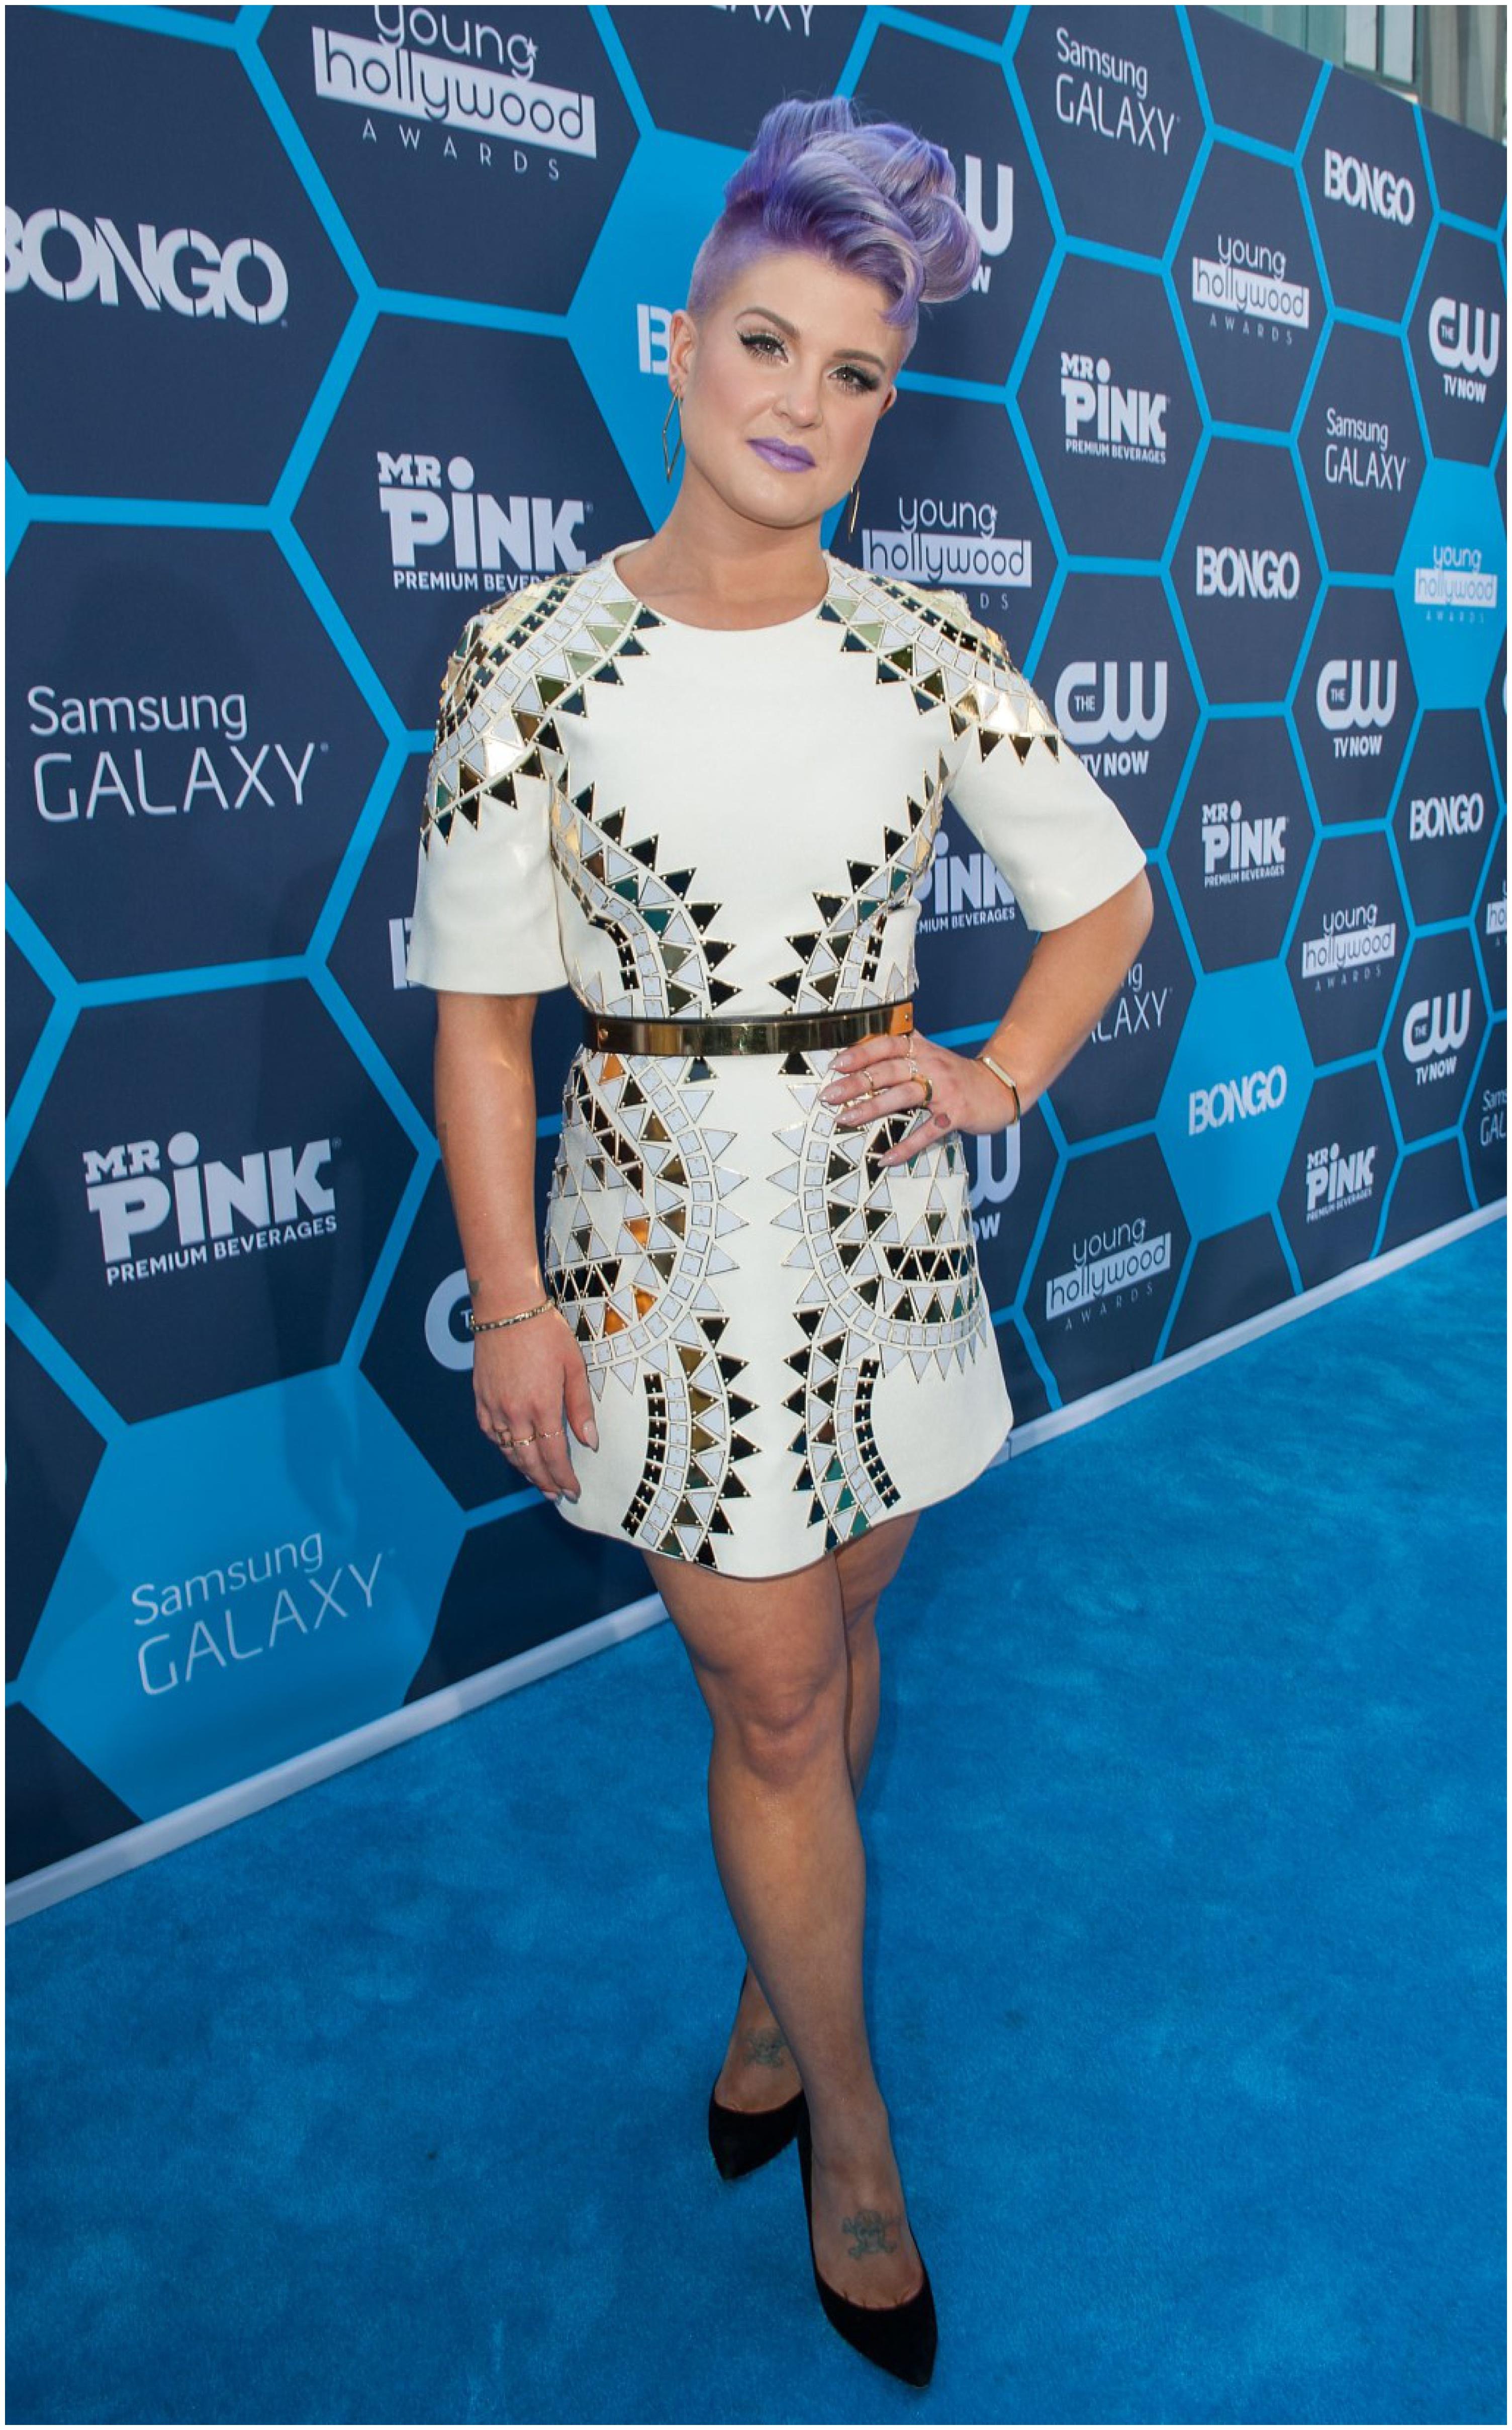 Dress Inspiration: Young Hollywood Awards 2014